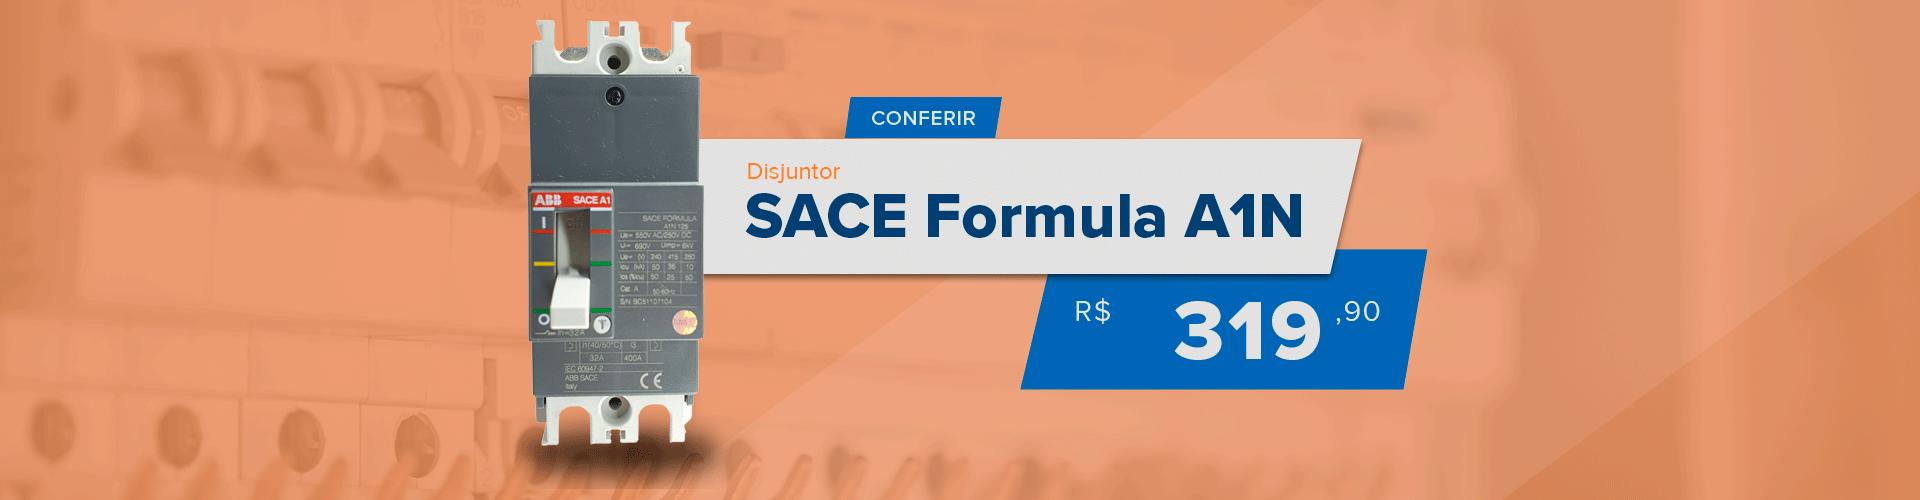 Disjuntor SACE Formula A1N